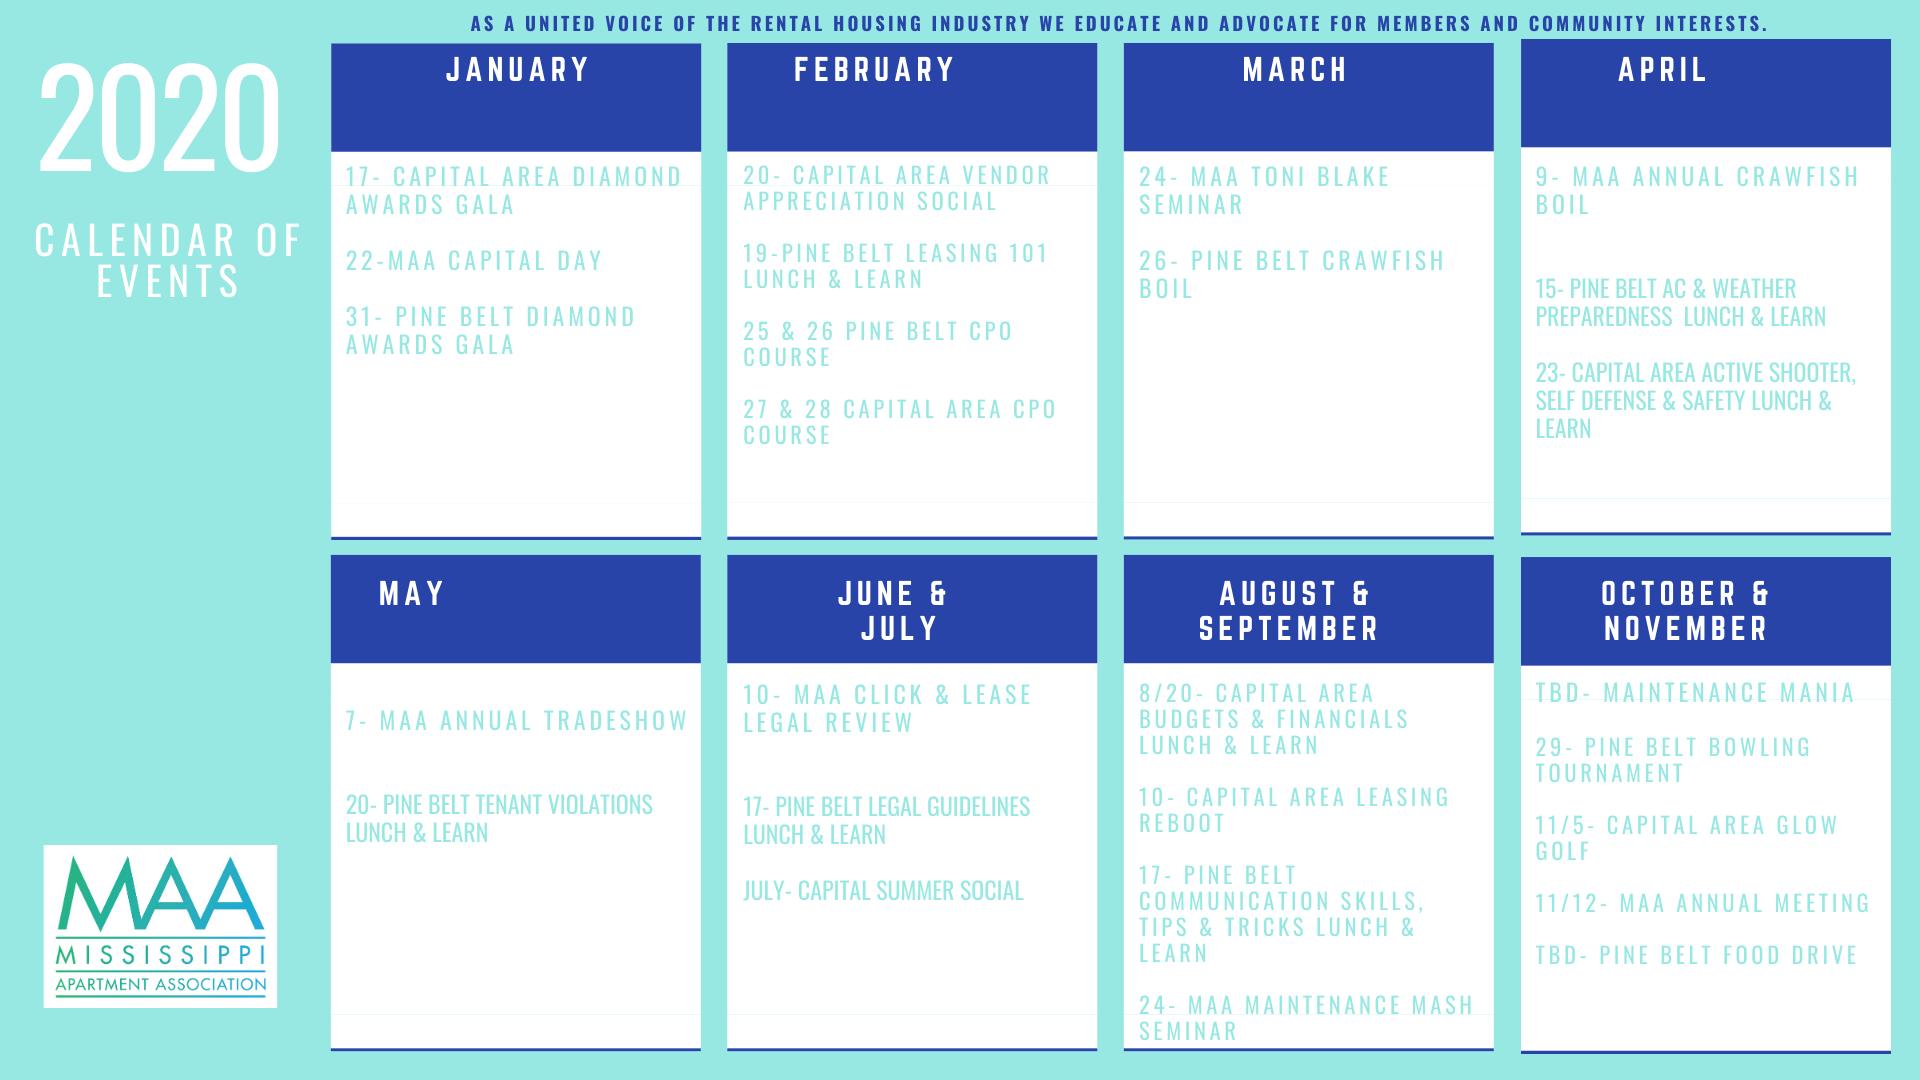 Events In Mississippi 2020.2020 Calendar Of Events Mississippi Apartment Association